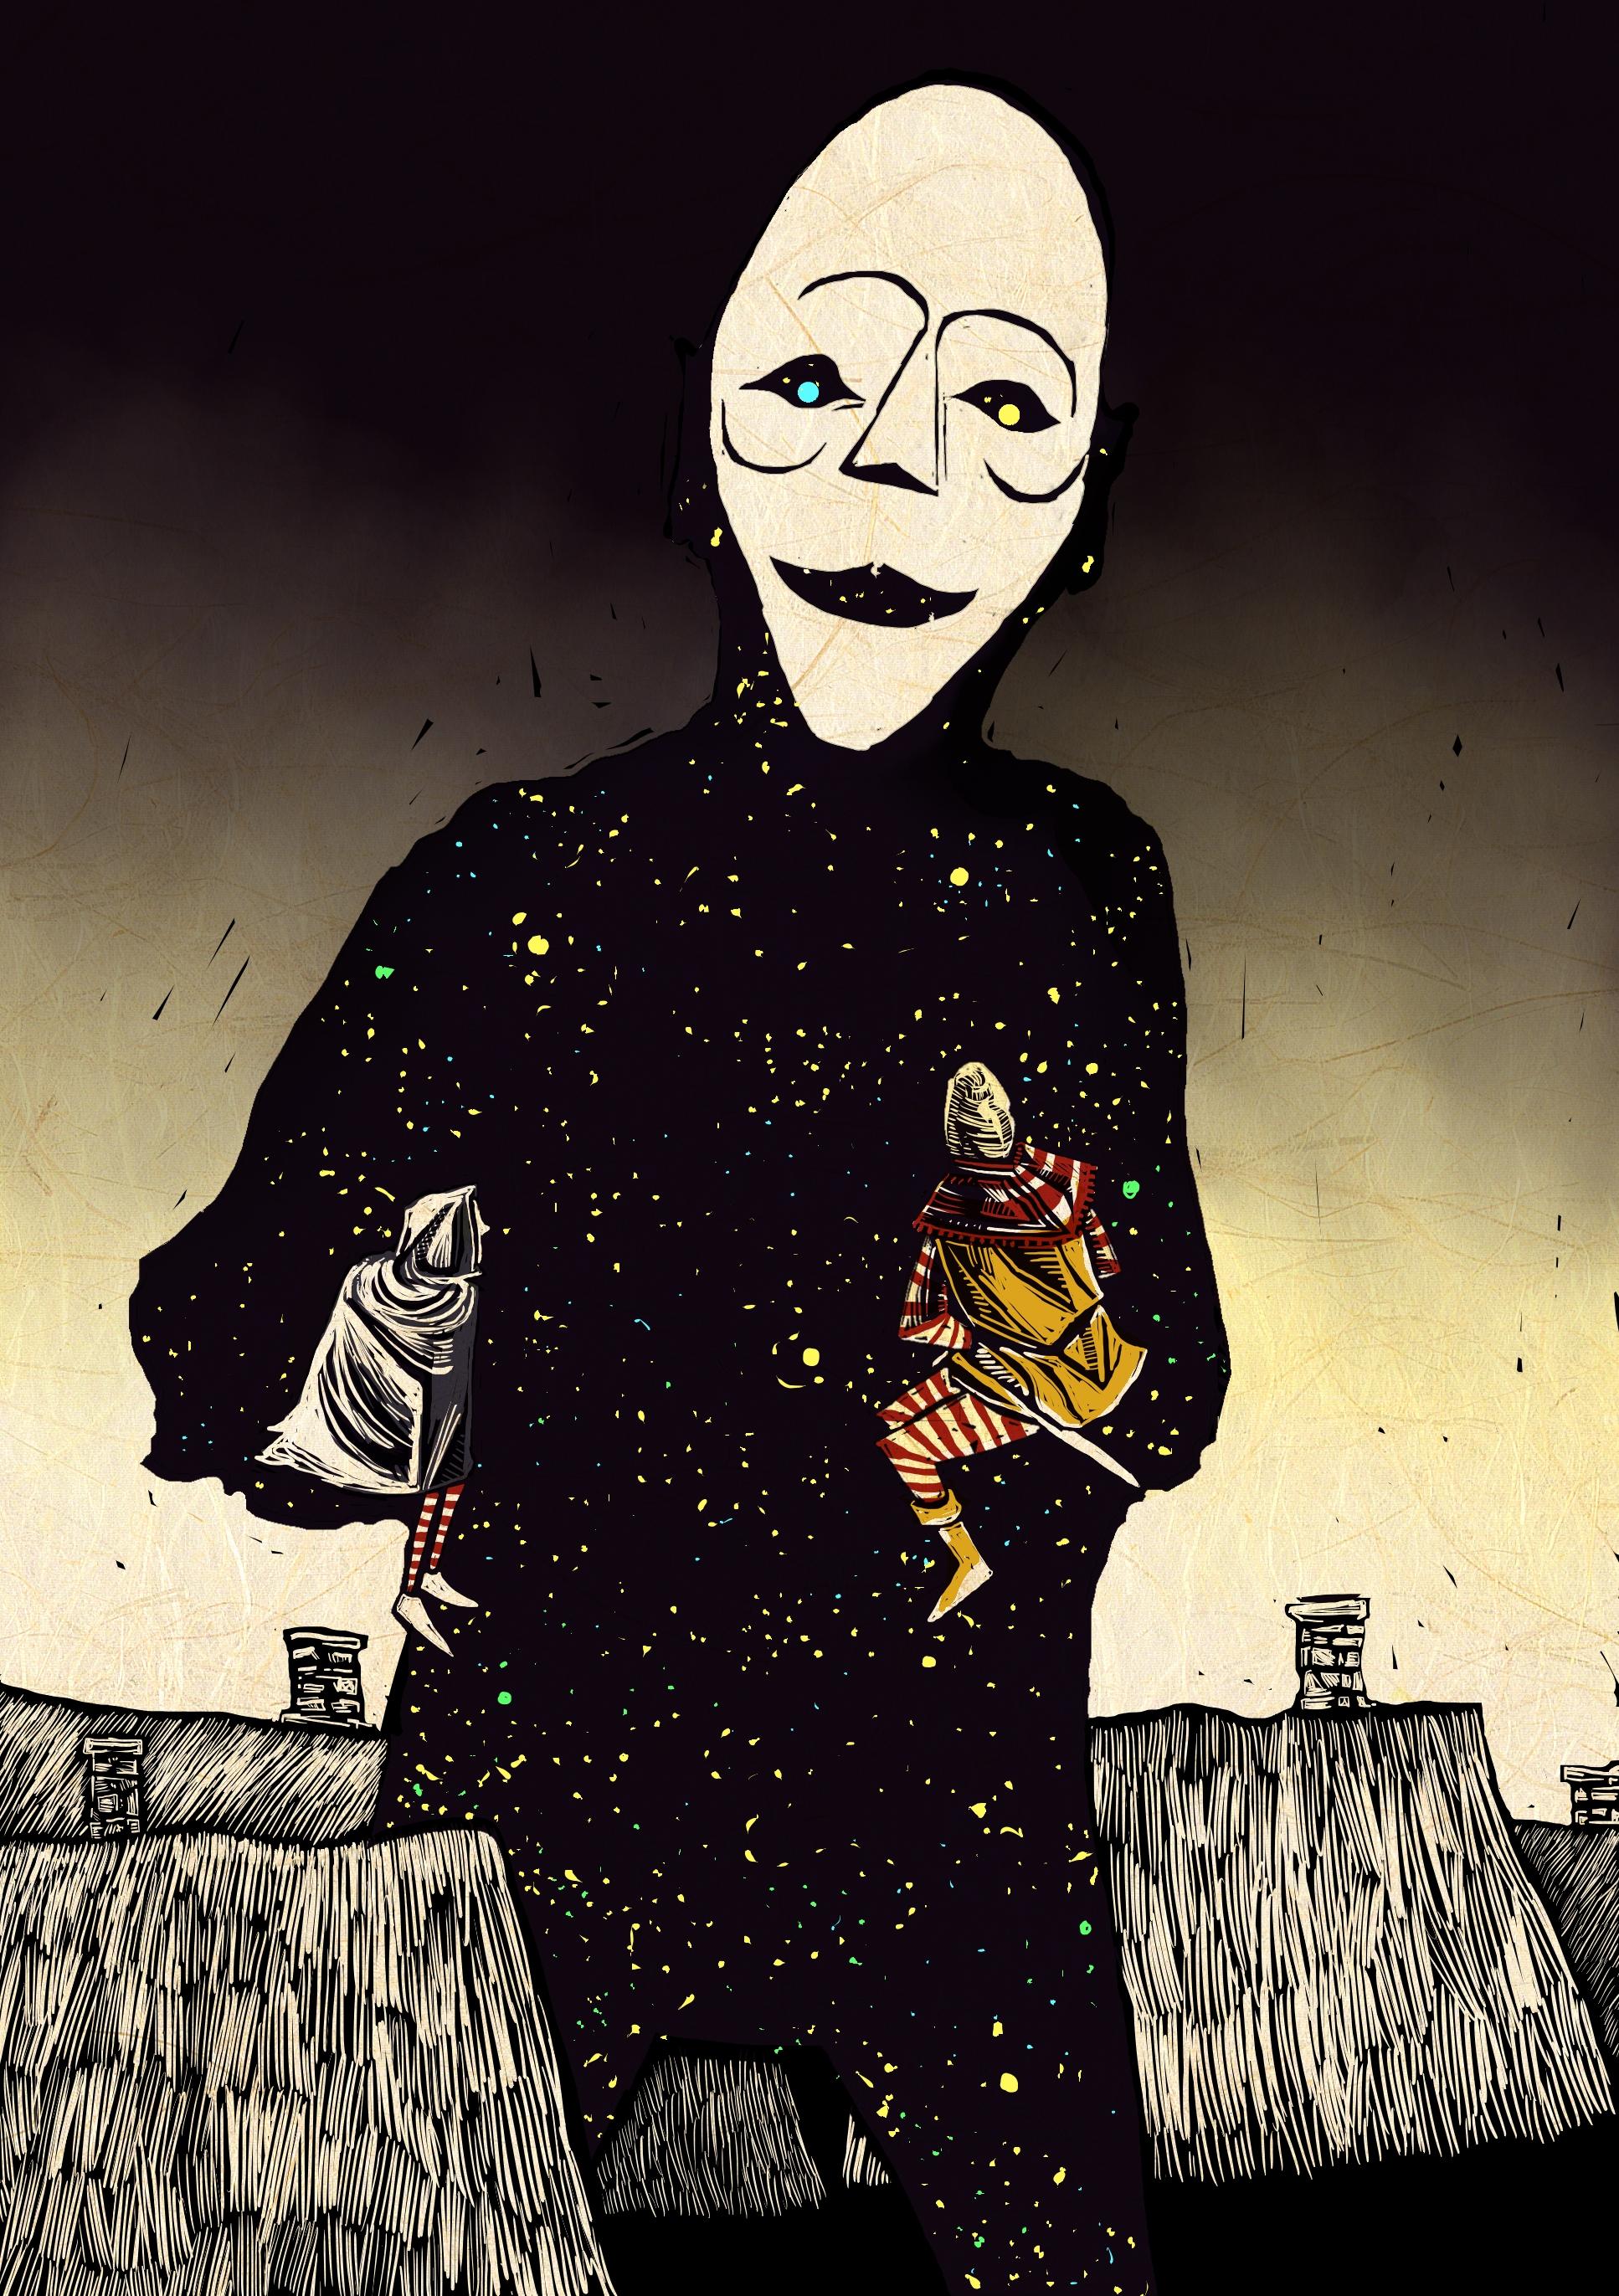 The Night Man